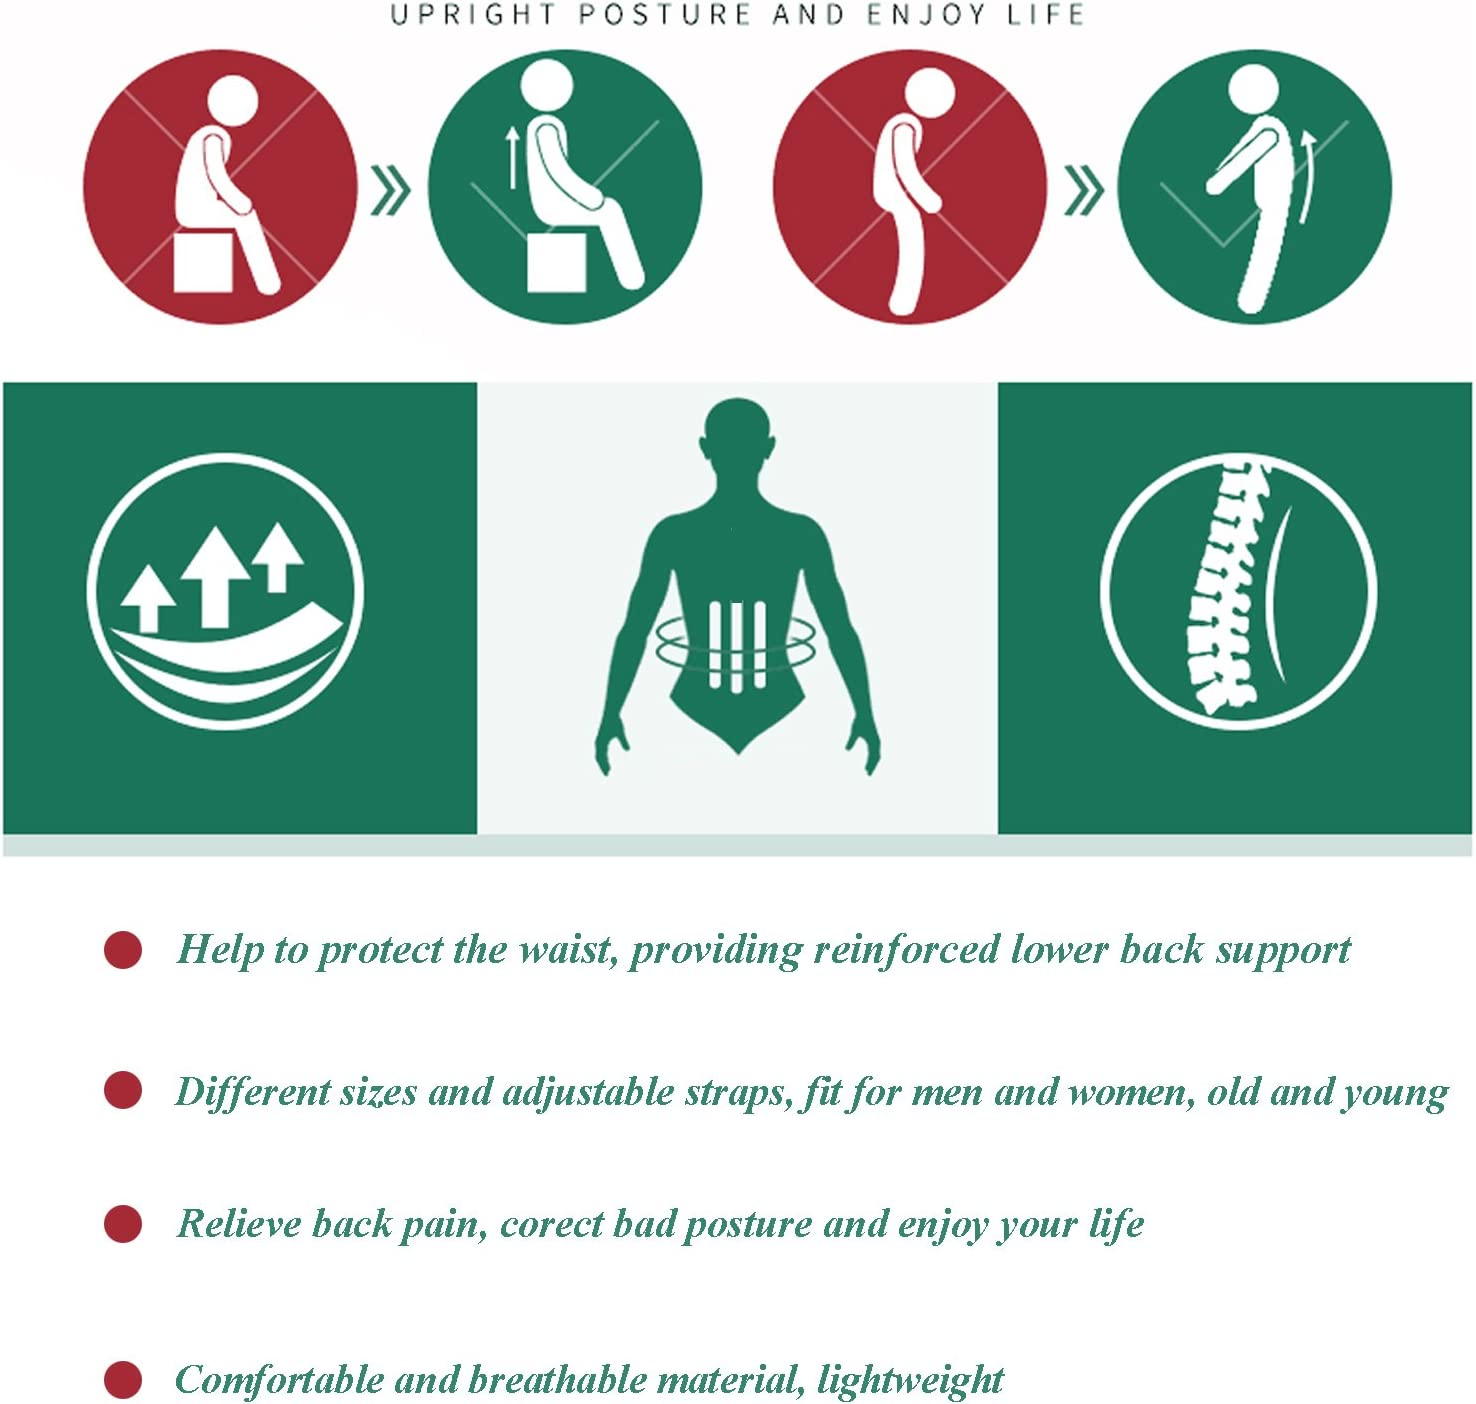 VALOIN Best Back Posture Corrector for Men and Women Back /& Shoulder-Adjustable Back Straightener ,078 Upper Back Brace for Clavicle Support and Protecting Pain from Neck